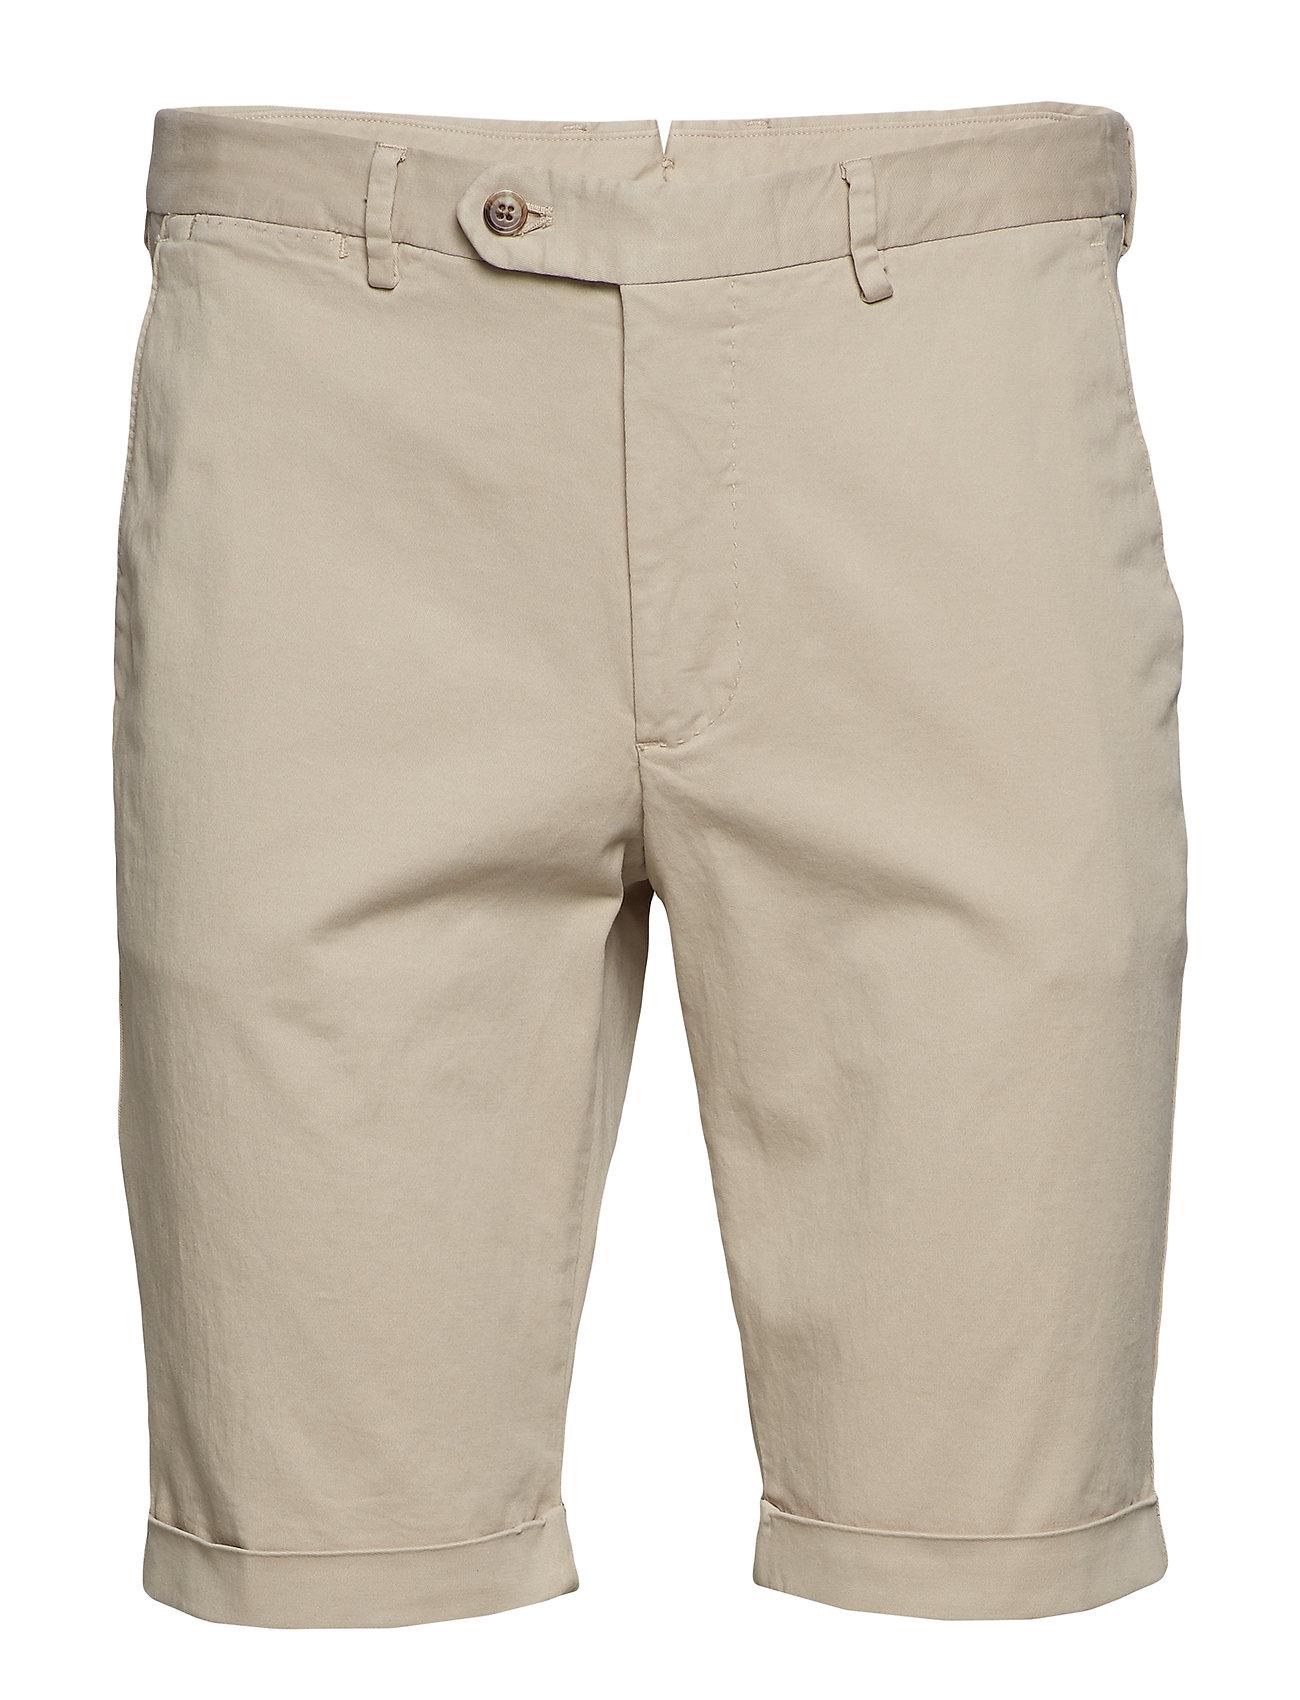 Oscar Jacobson Declan Shorts - 485 - BEIGE SAND